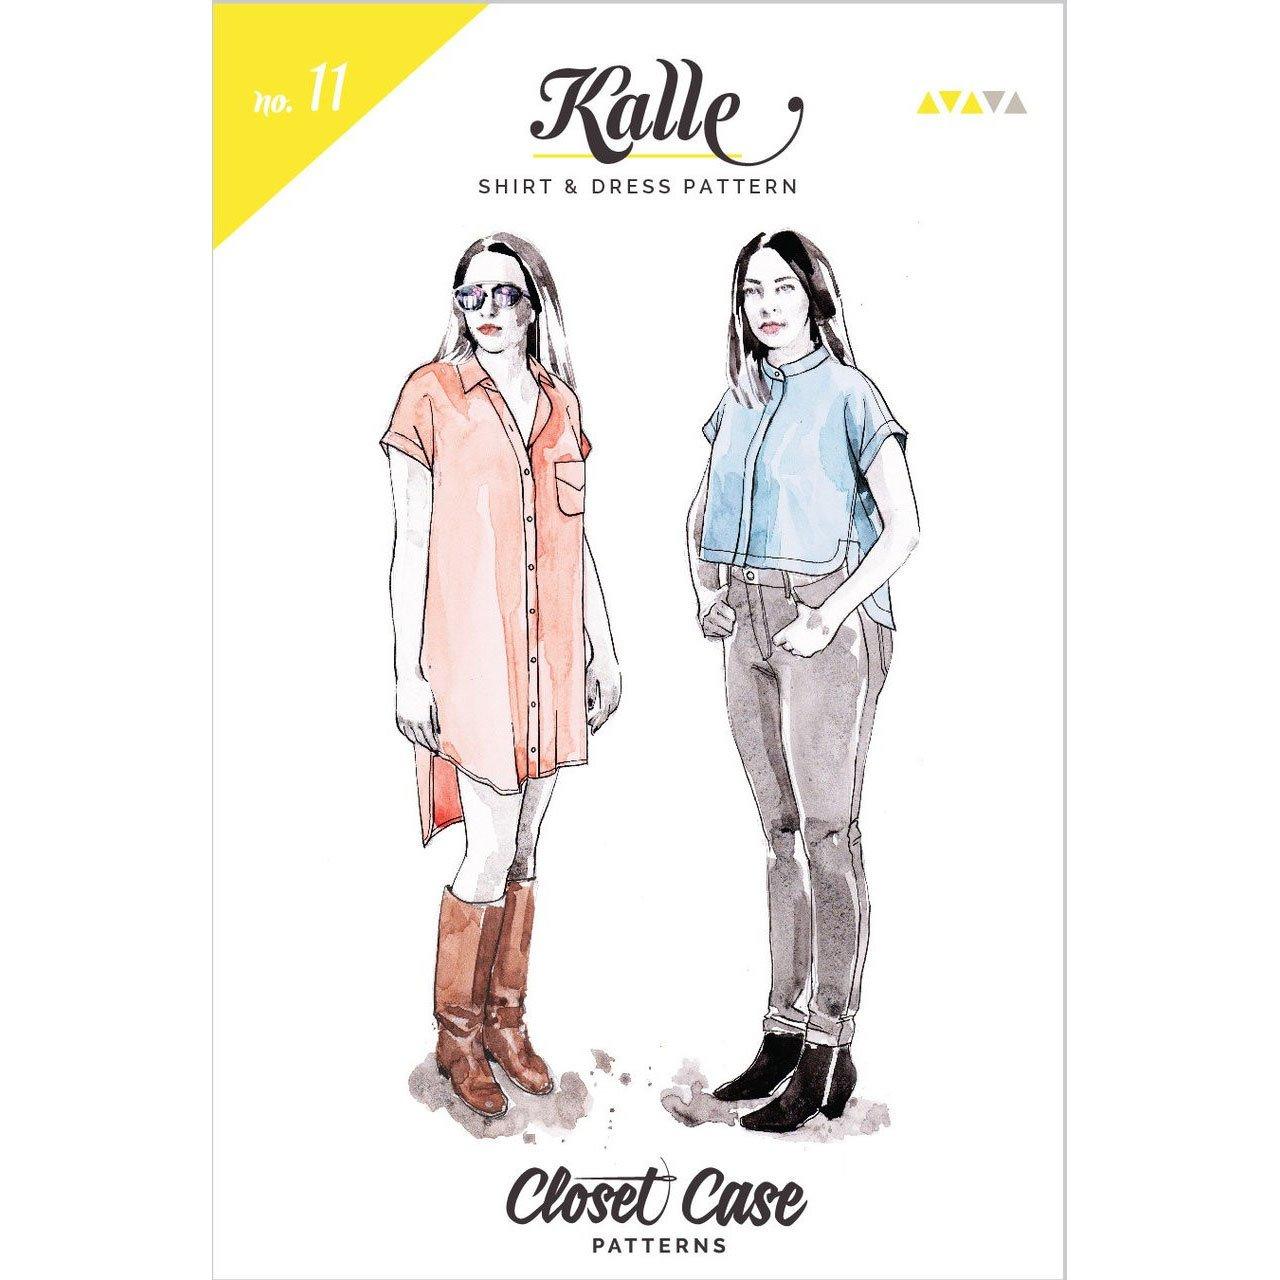 Closet Case nka Closet Core - Kalle Shirt & Shirtdress